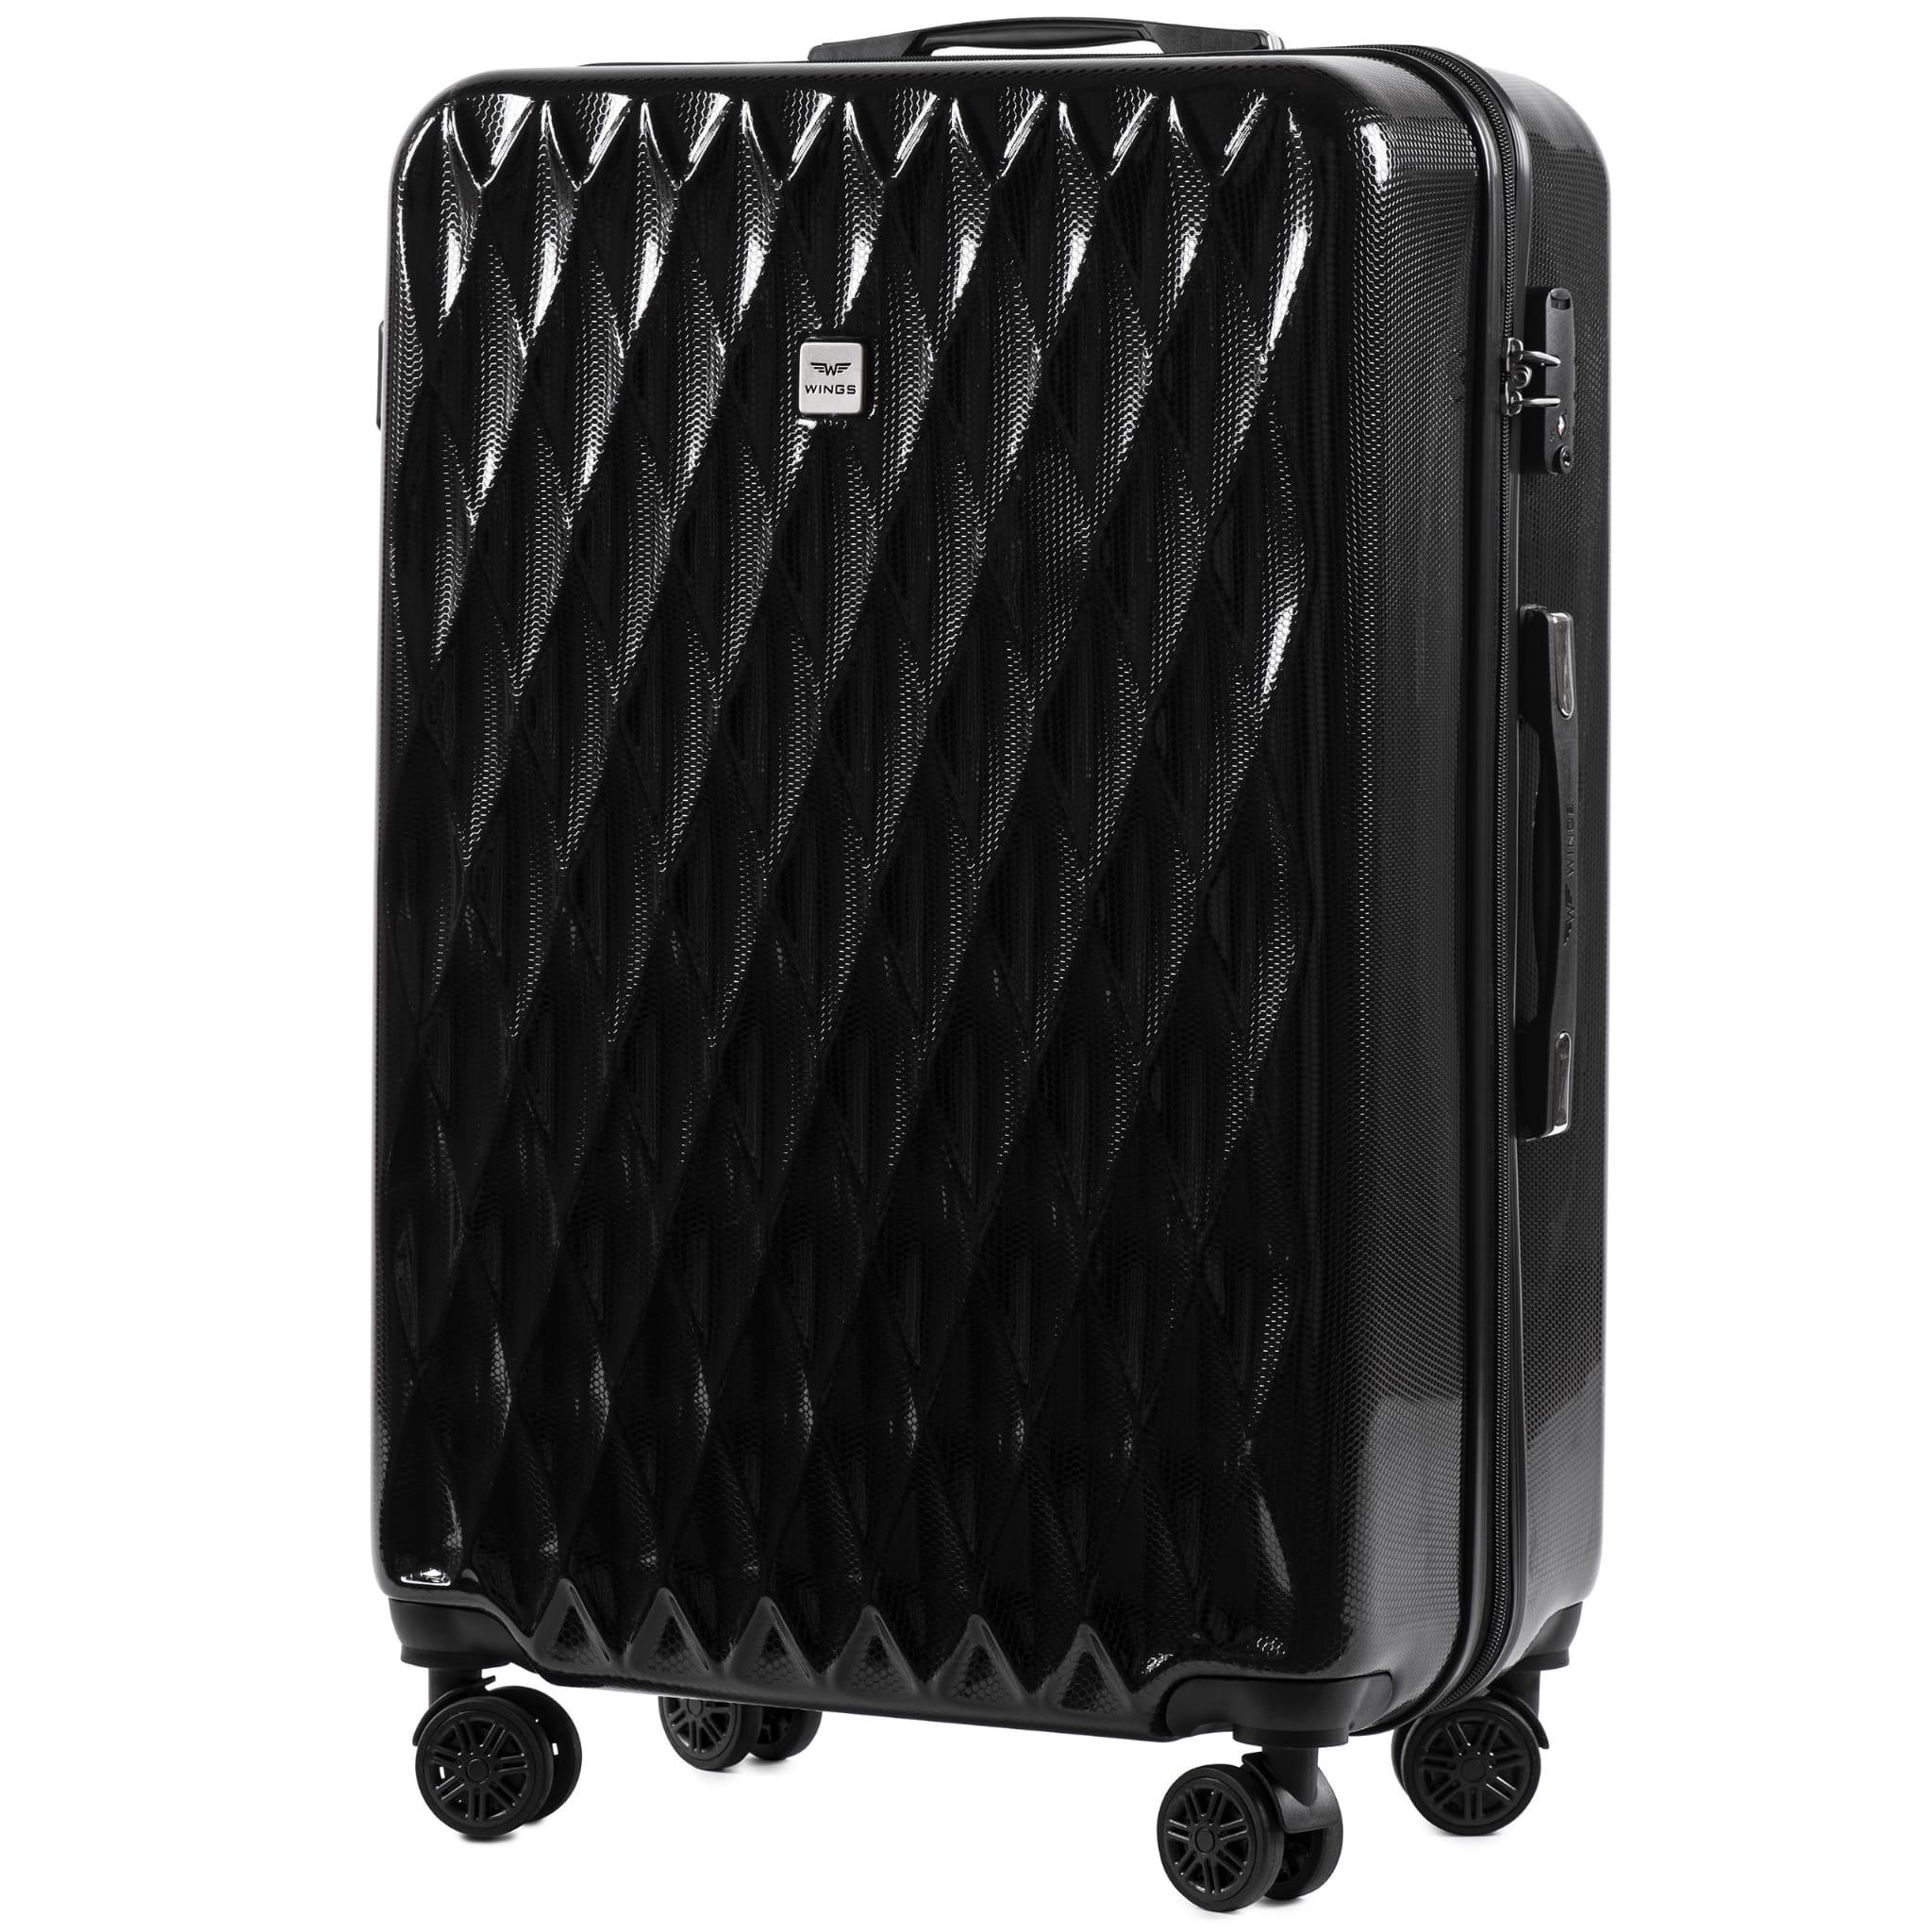 БОЛЬШОЙ ЧЕМОДАН WINGS PC190 L BLACK  PREMIUM НА 4-Х КАУЧУКОВЫХ КОЛЕСАХ! Для багажа ,до 23 кг!